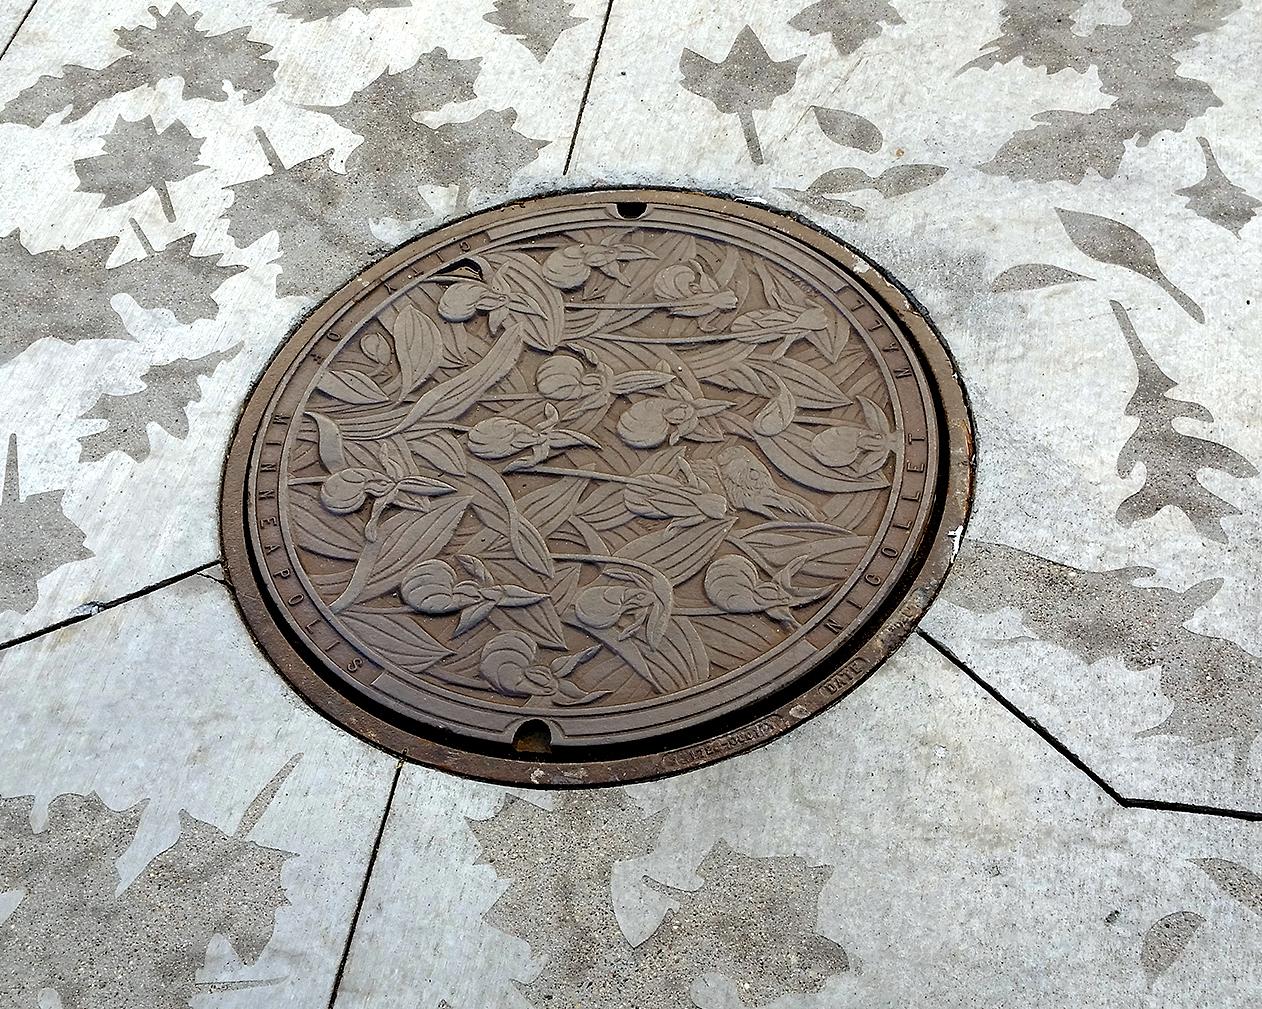 Hail Minnesota manhole covers by Kate Burke